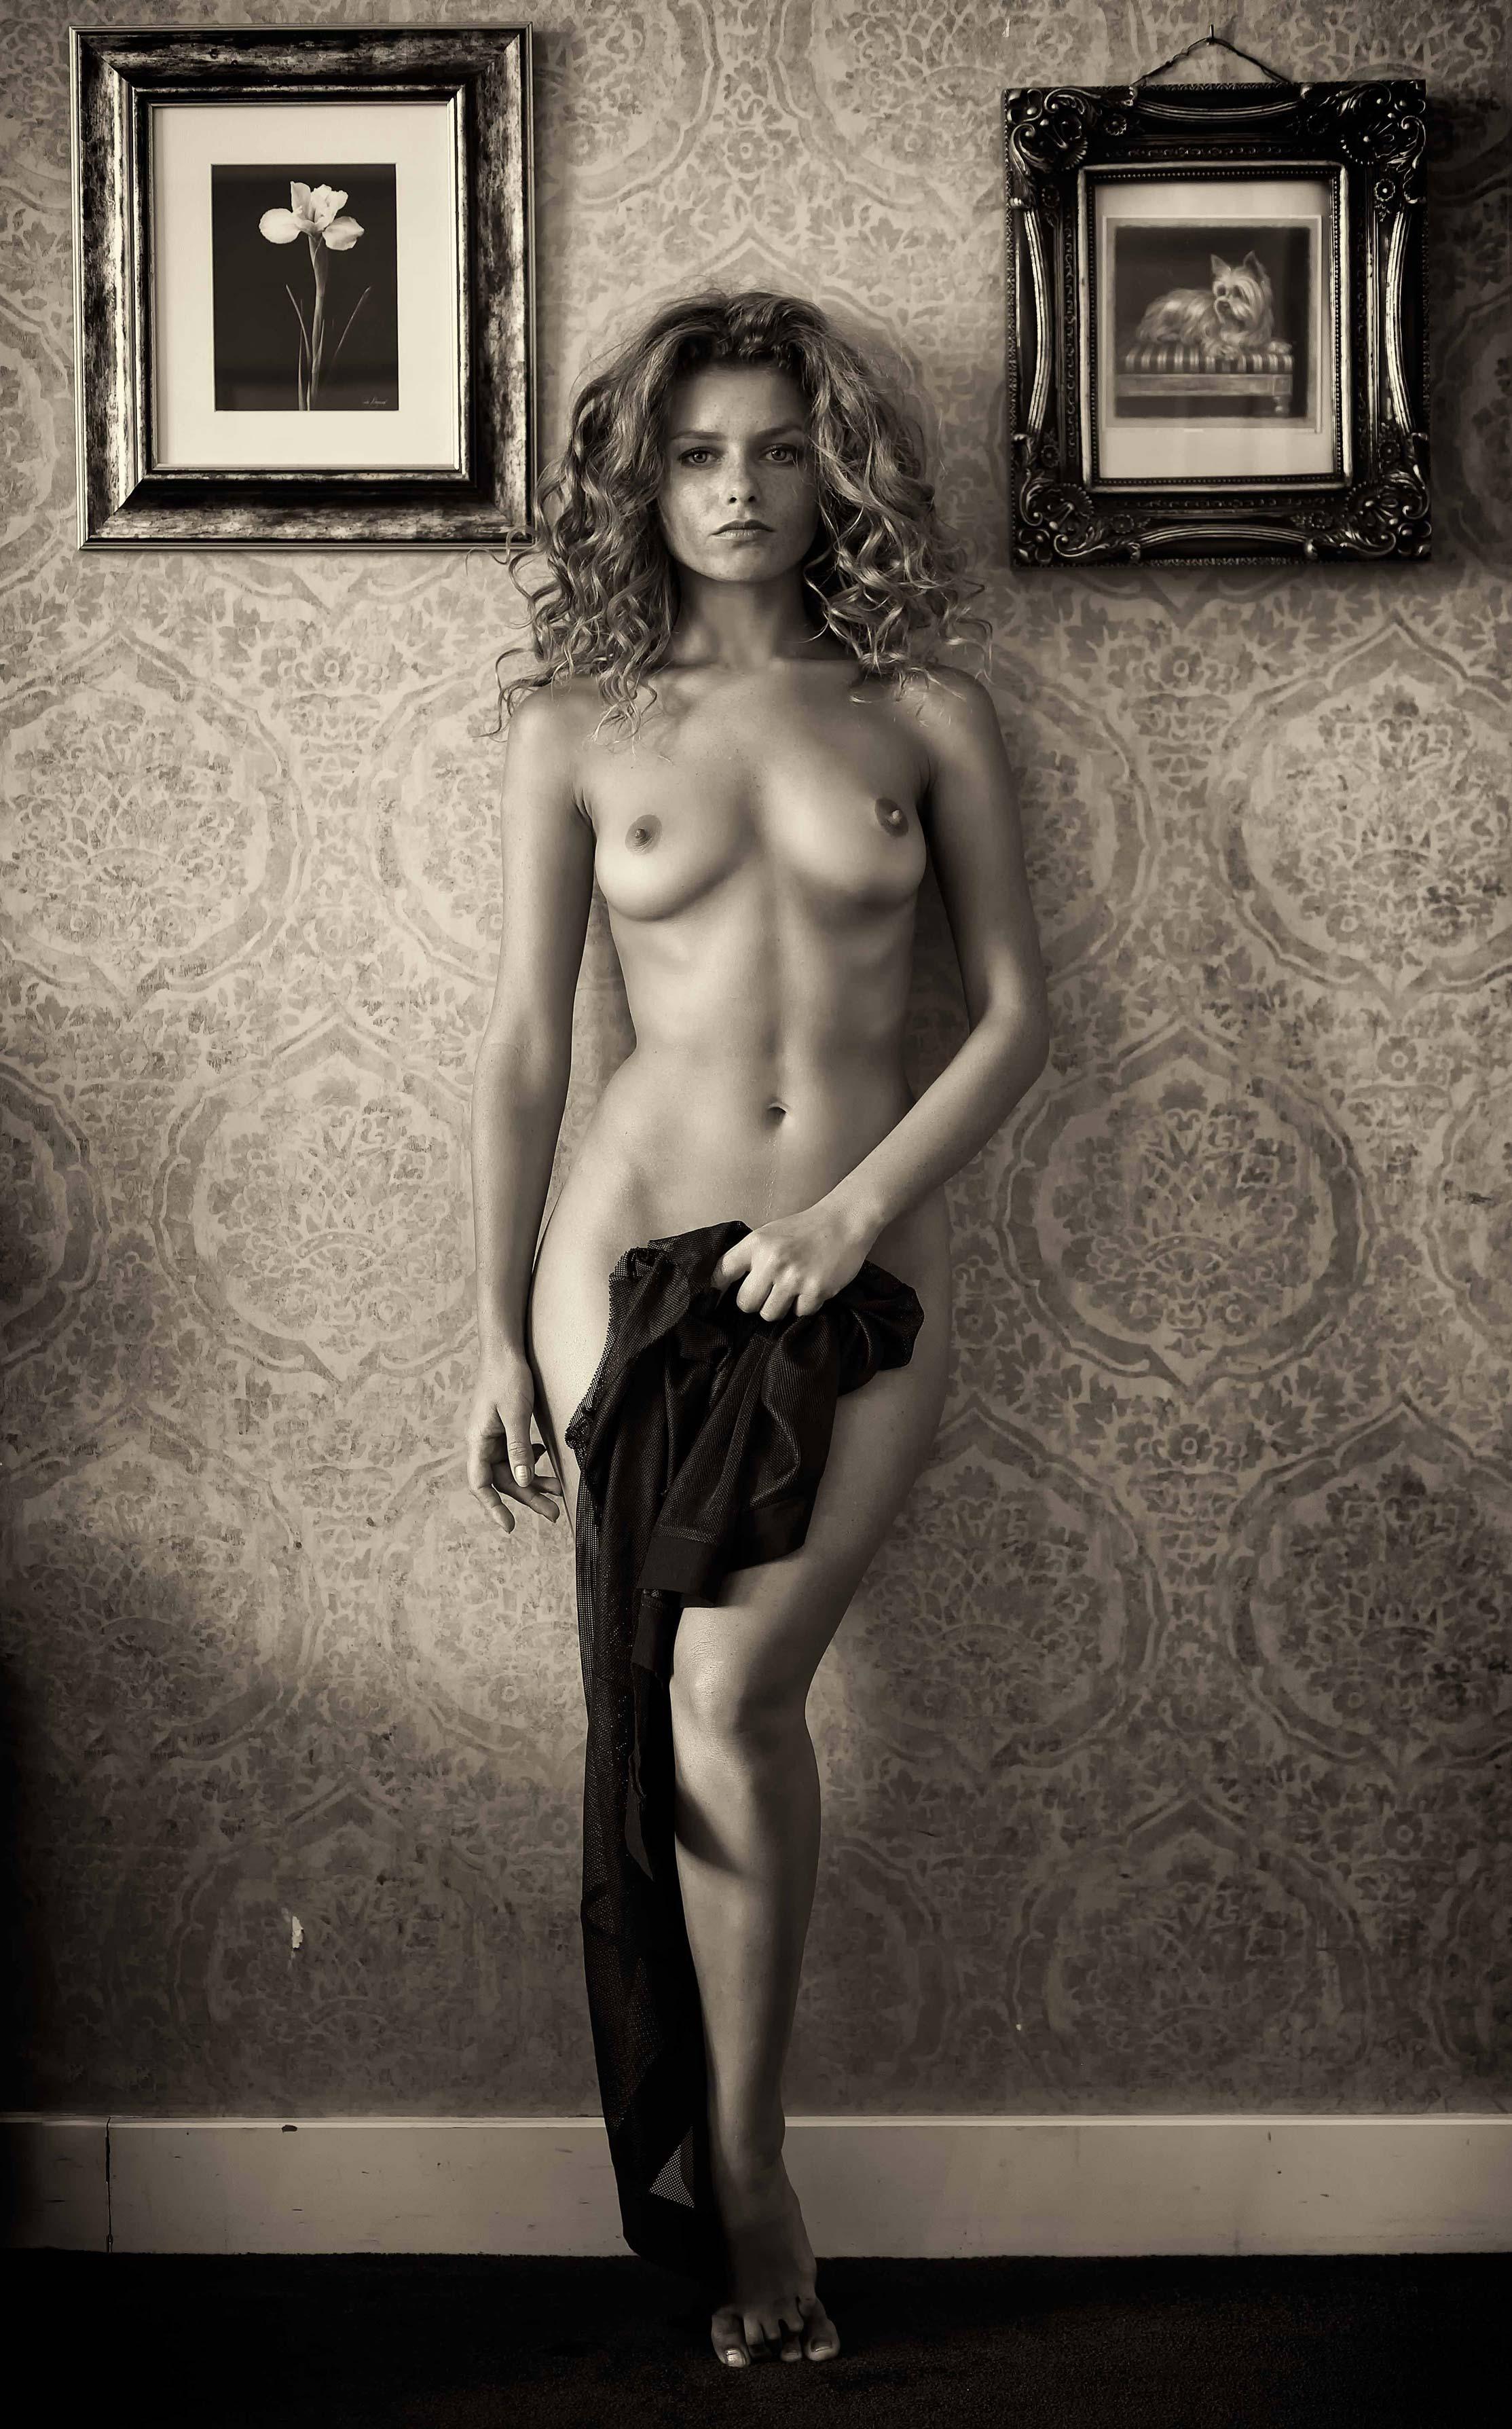 Юлия Ярошенко / Julia Yaroshenko nude by Ben Ernst